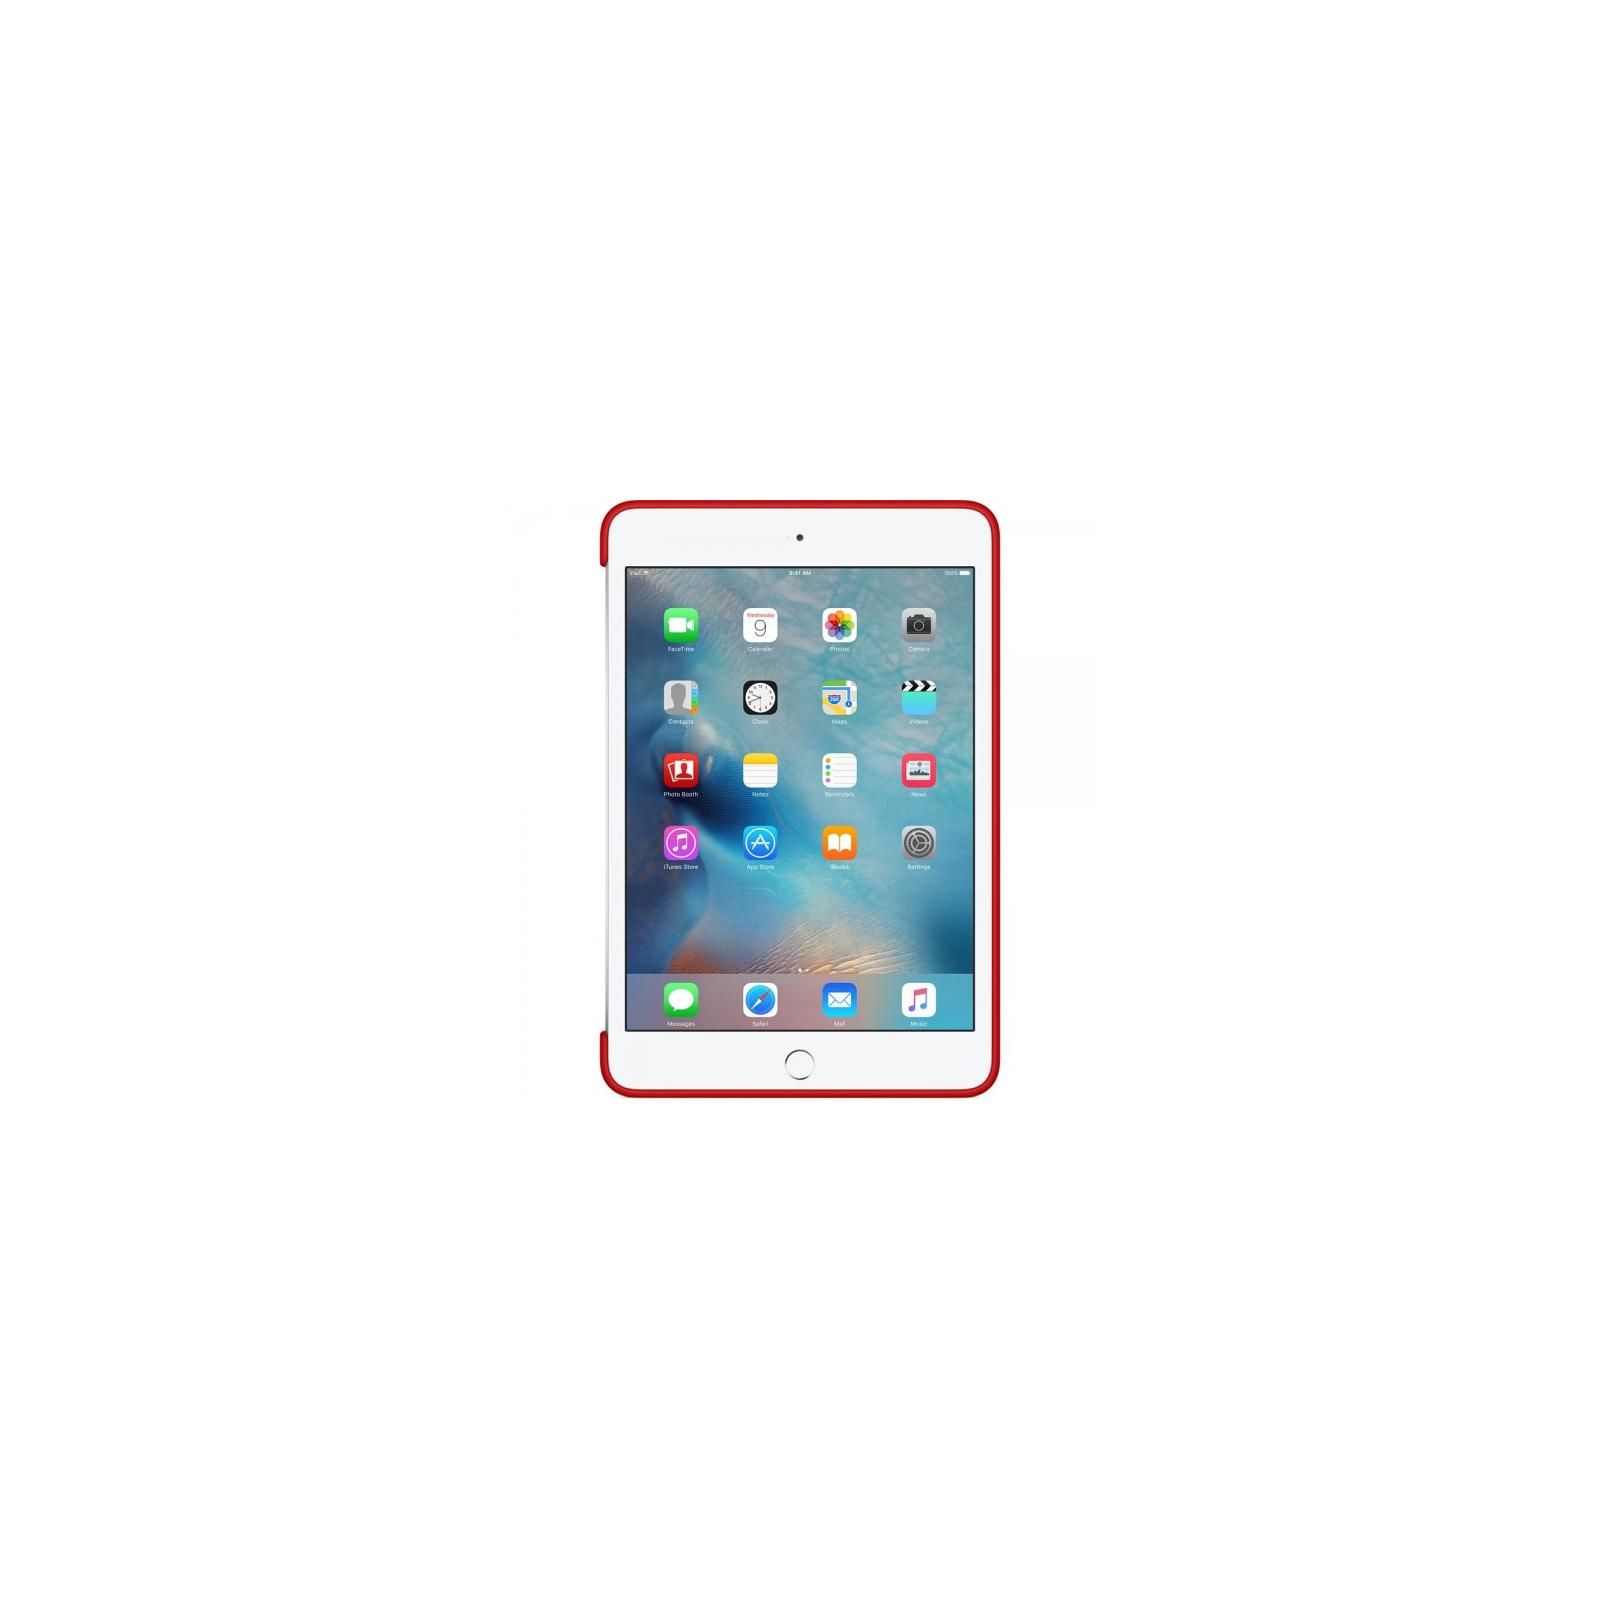 Чехол для планшета Apple iPad mini 4 Red (MKLN2ZM/A) изображение 4